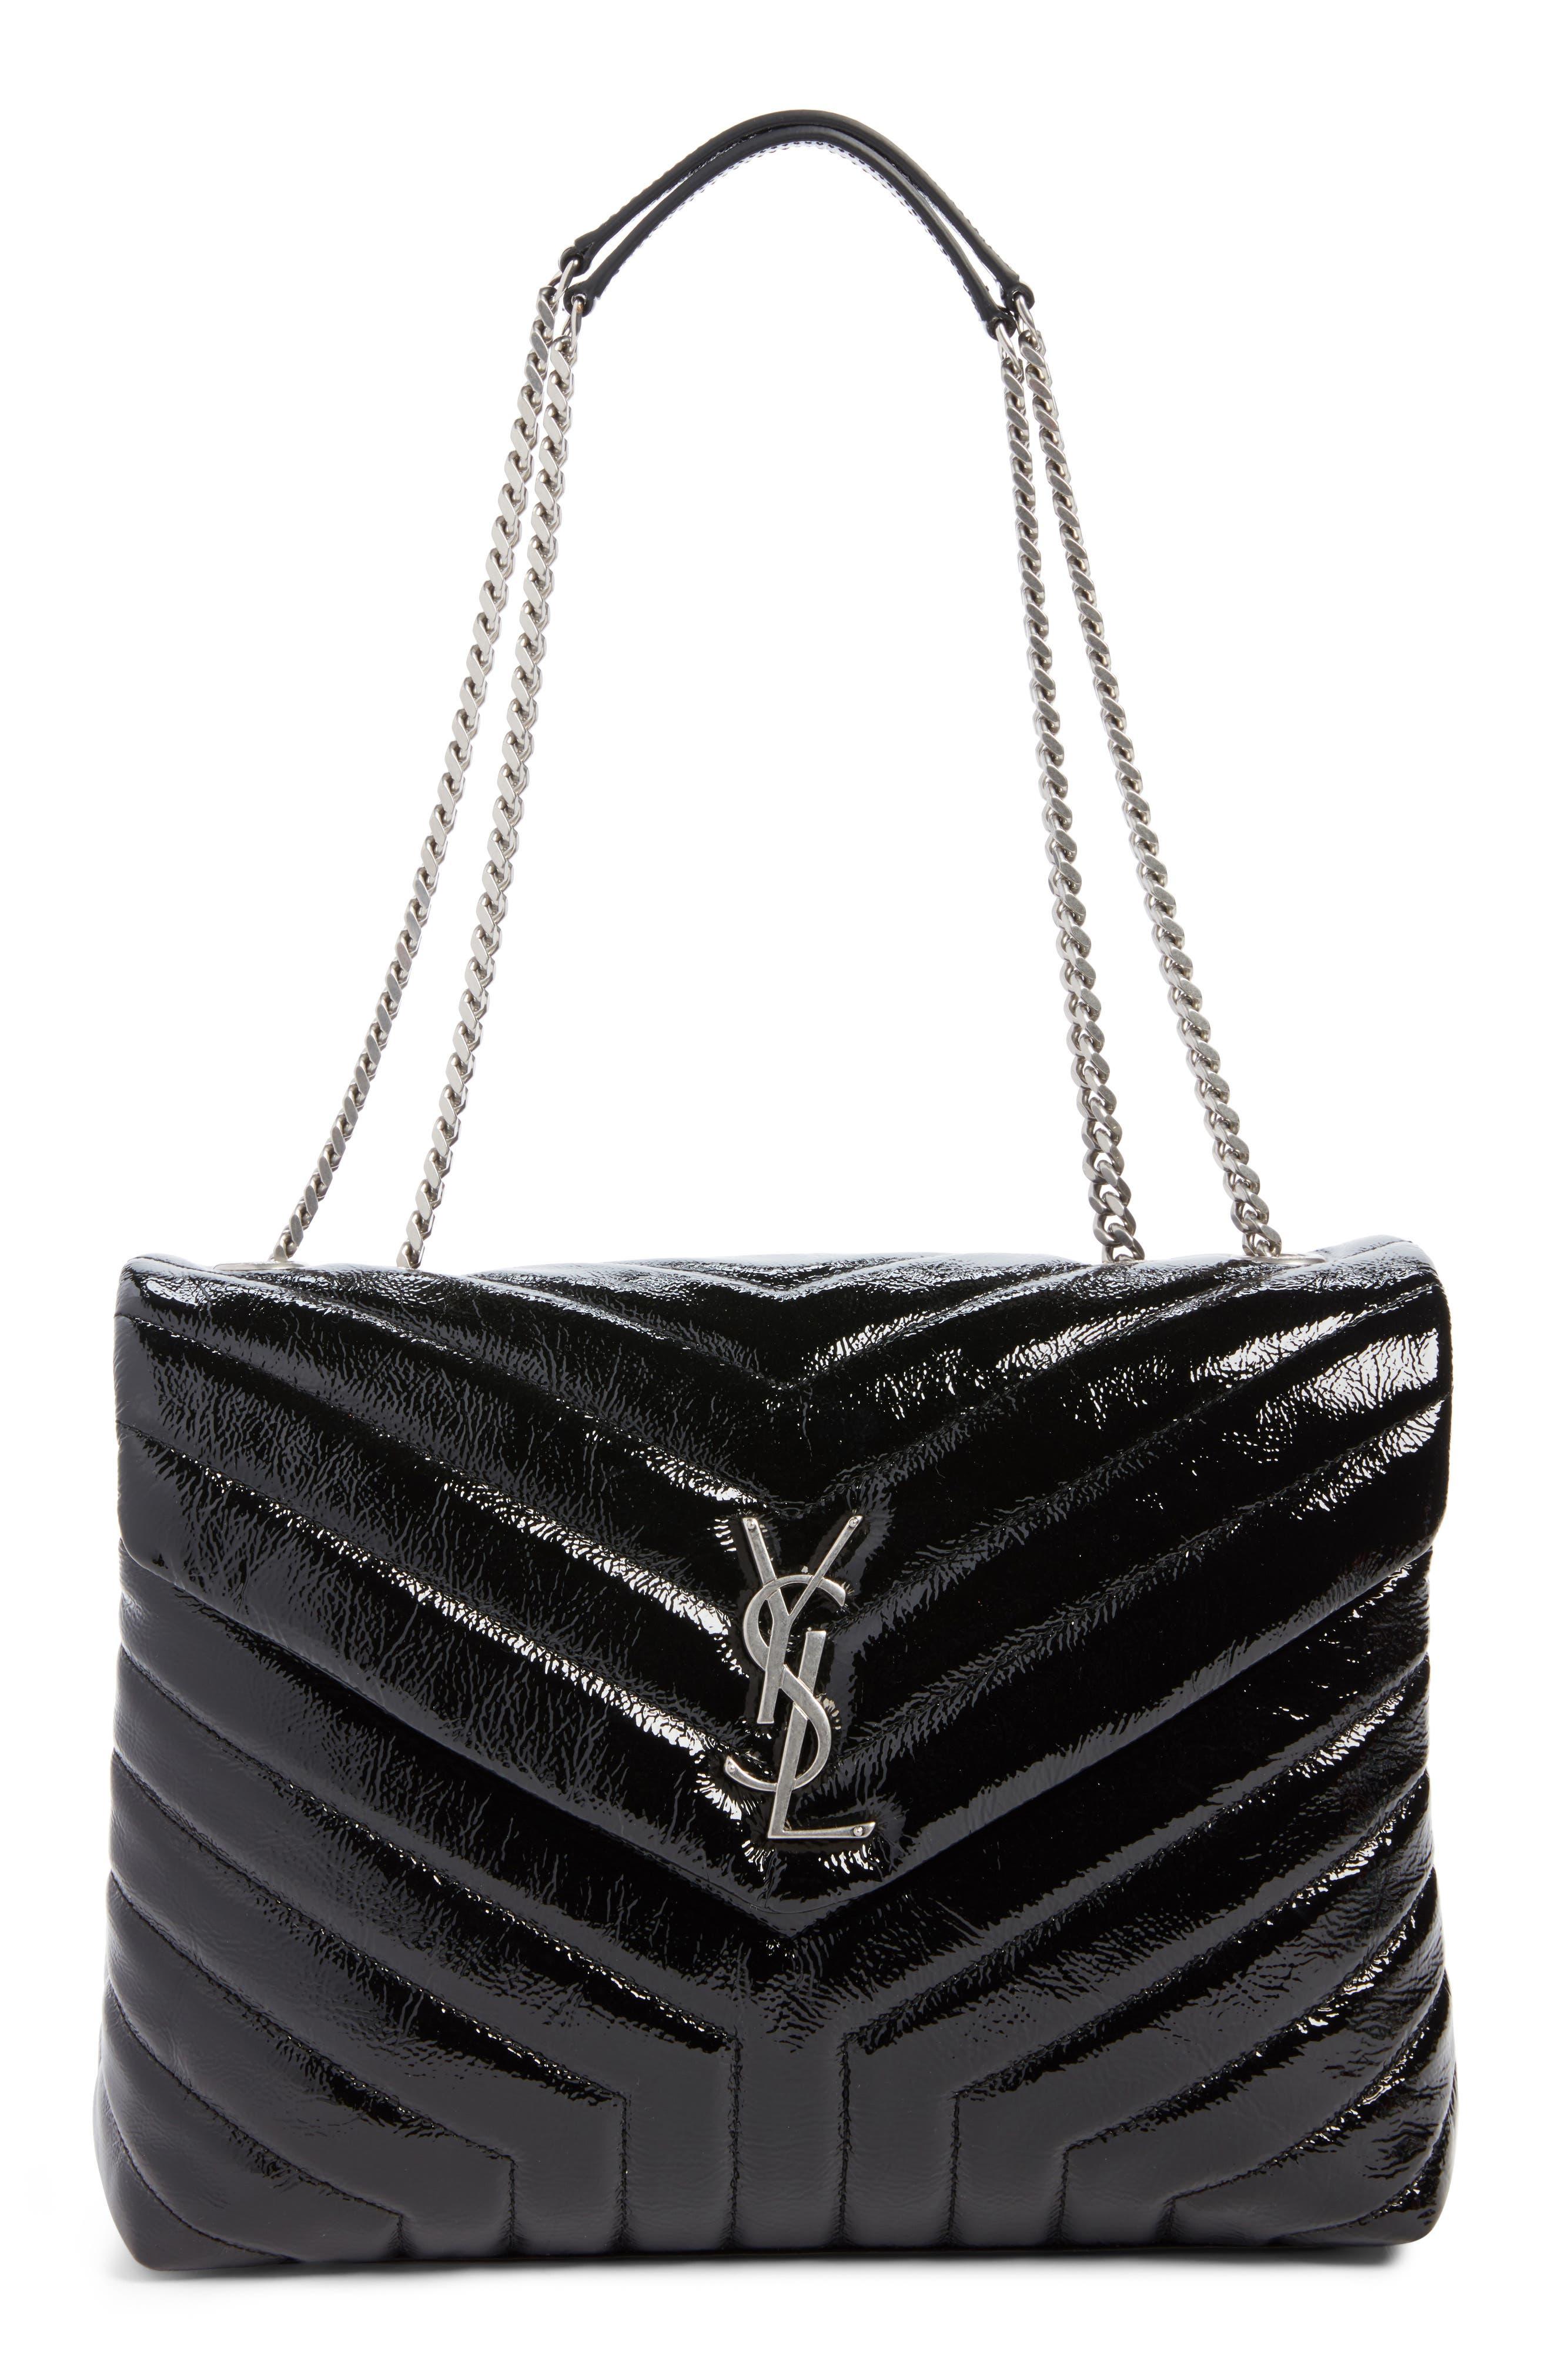 Main Image - Saint Laurent Medium LouLou Patent Leather Shoulder Bag